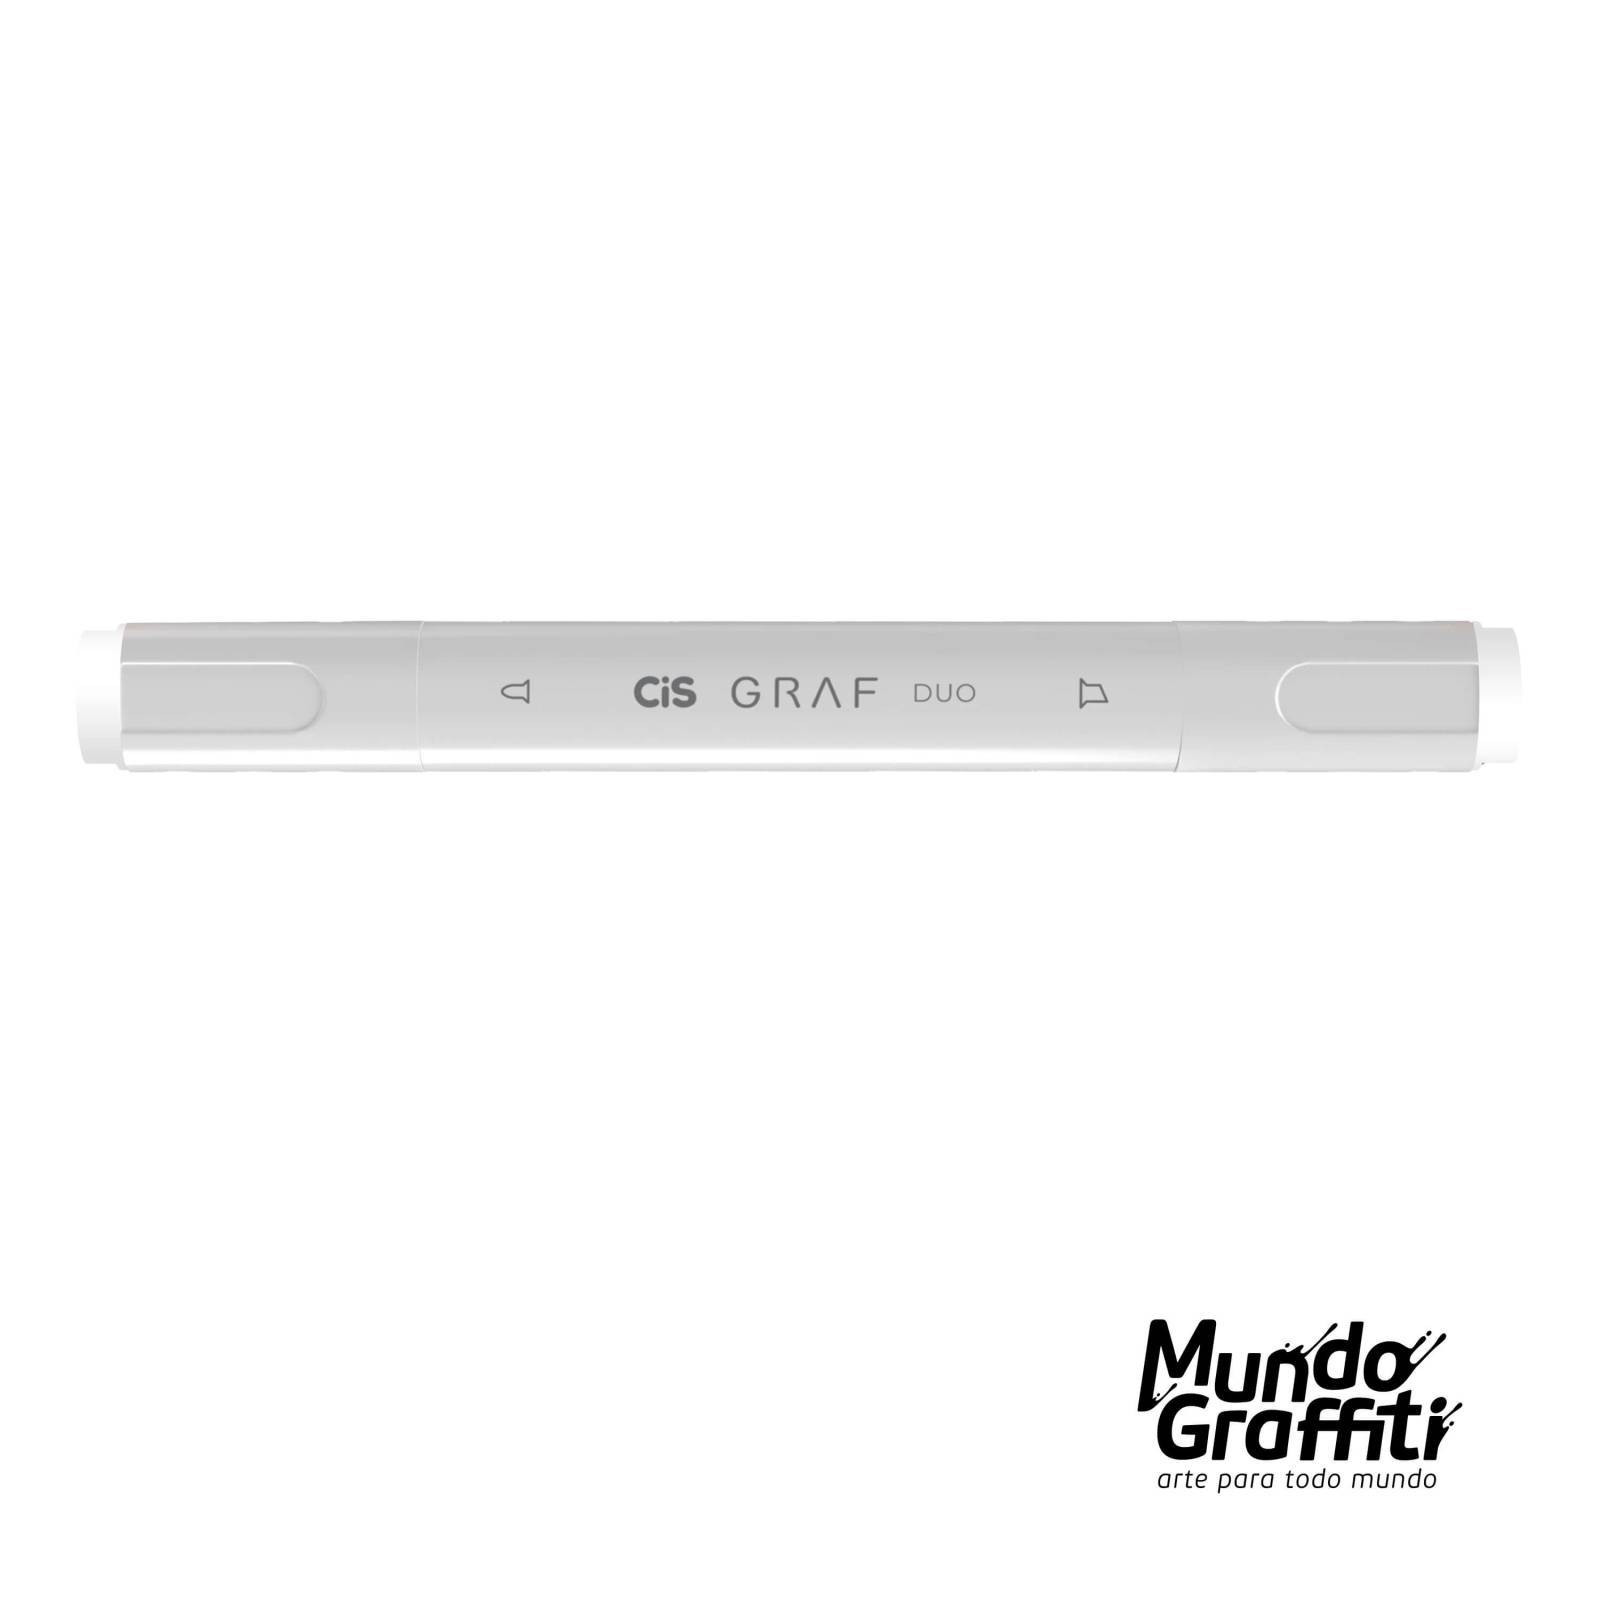 Marcador Cis Graf Duo Blender N1 - Mundo Graffiti